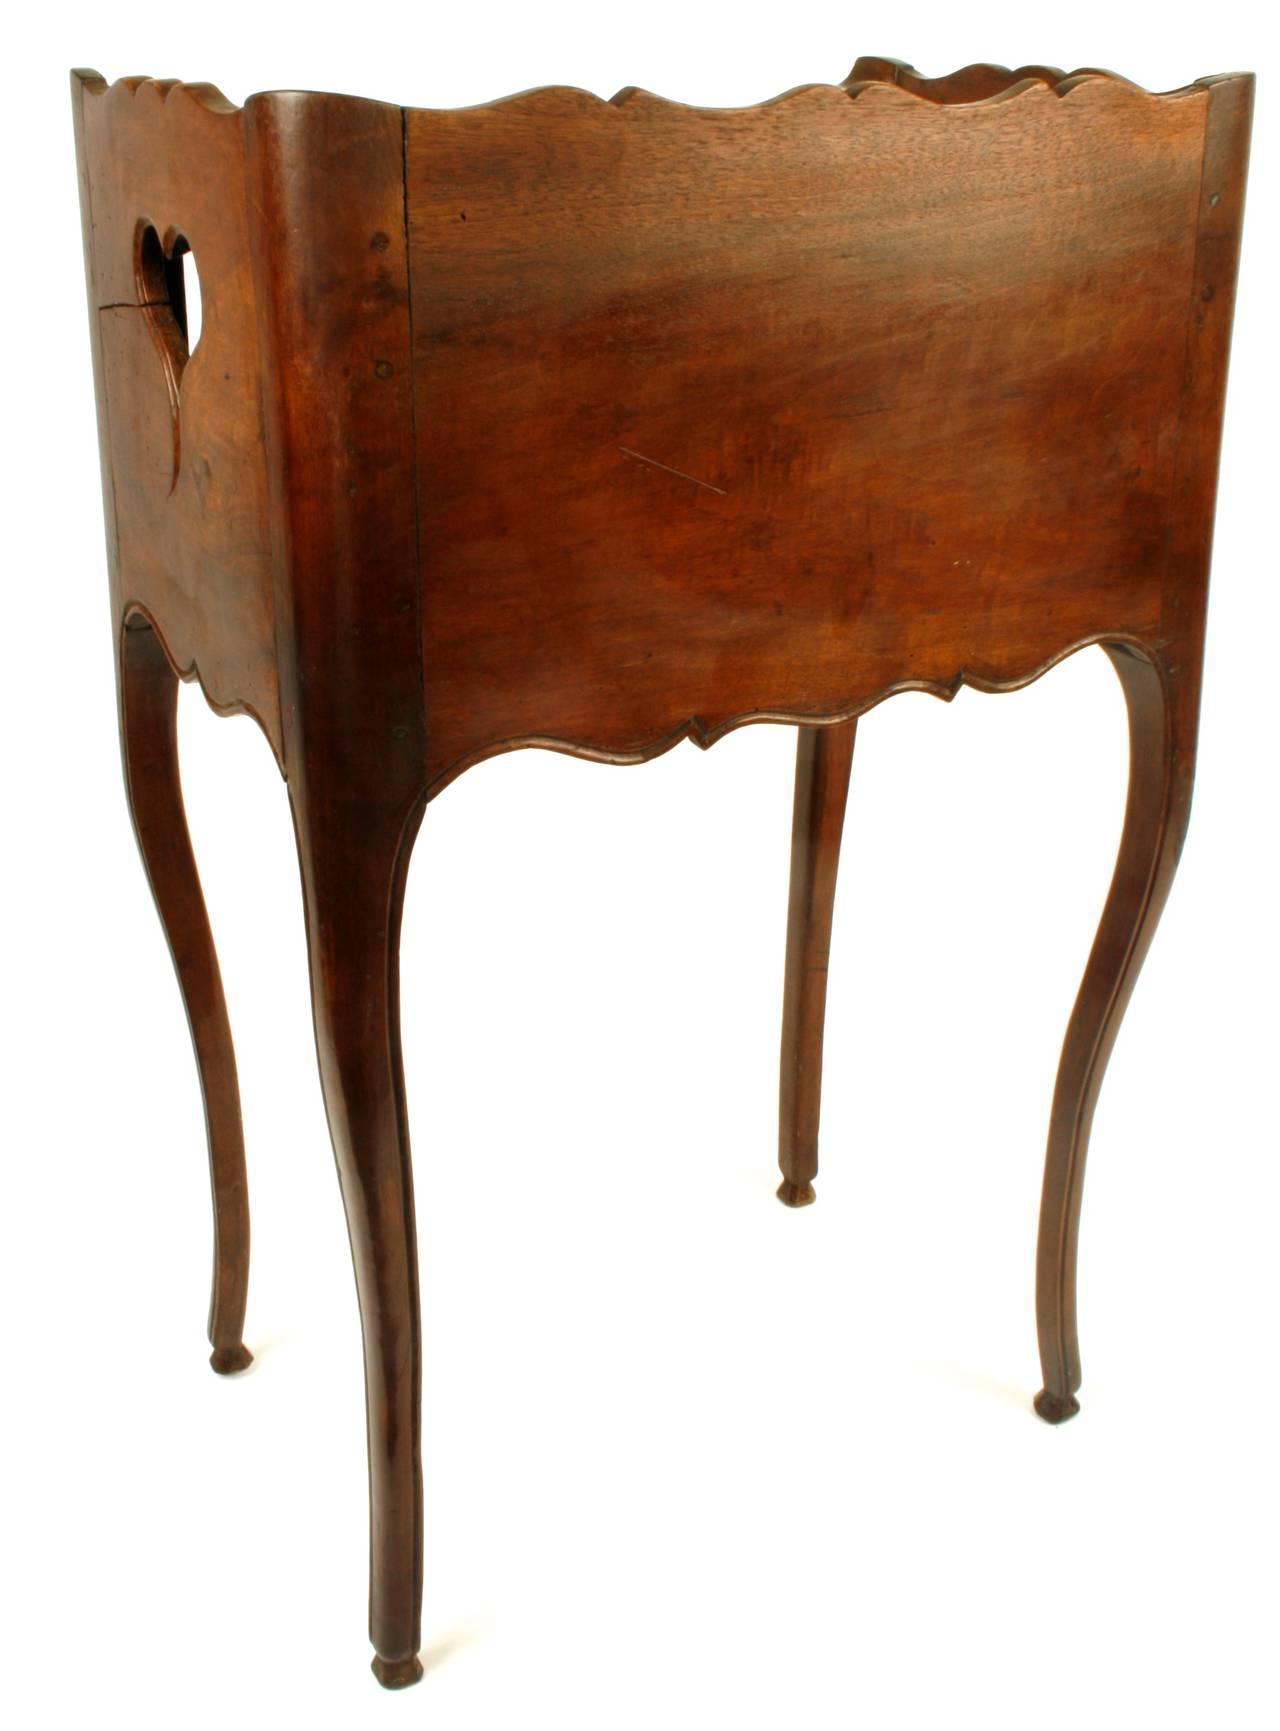 louis xv walnut table de nuit circa 1790 at 1stdibs. Black Bedroom Furniture Sets. Home Design Ideas